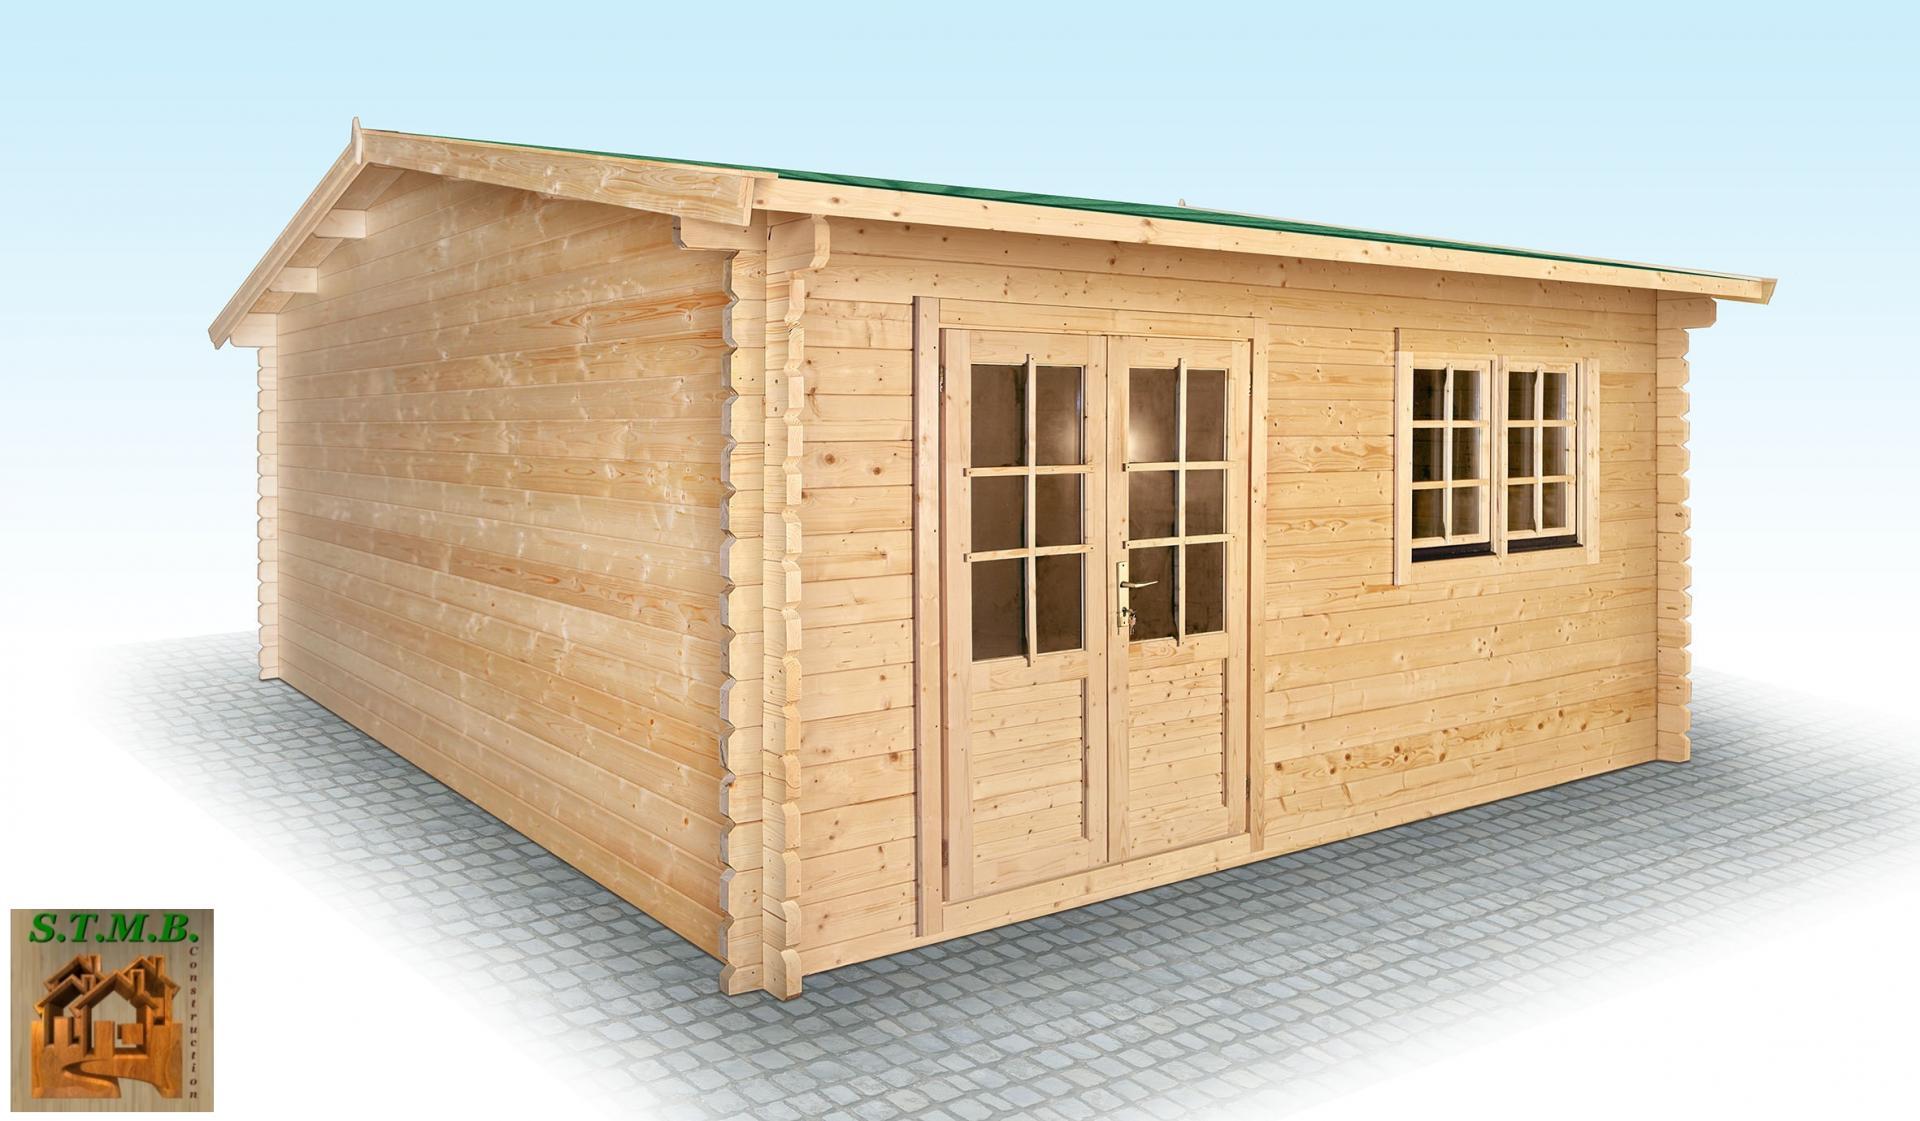 Ph1 kit chalet bois habitable loisirs hiba 22 stmb construction